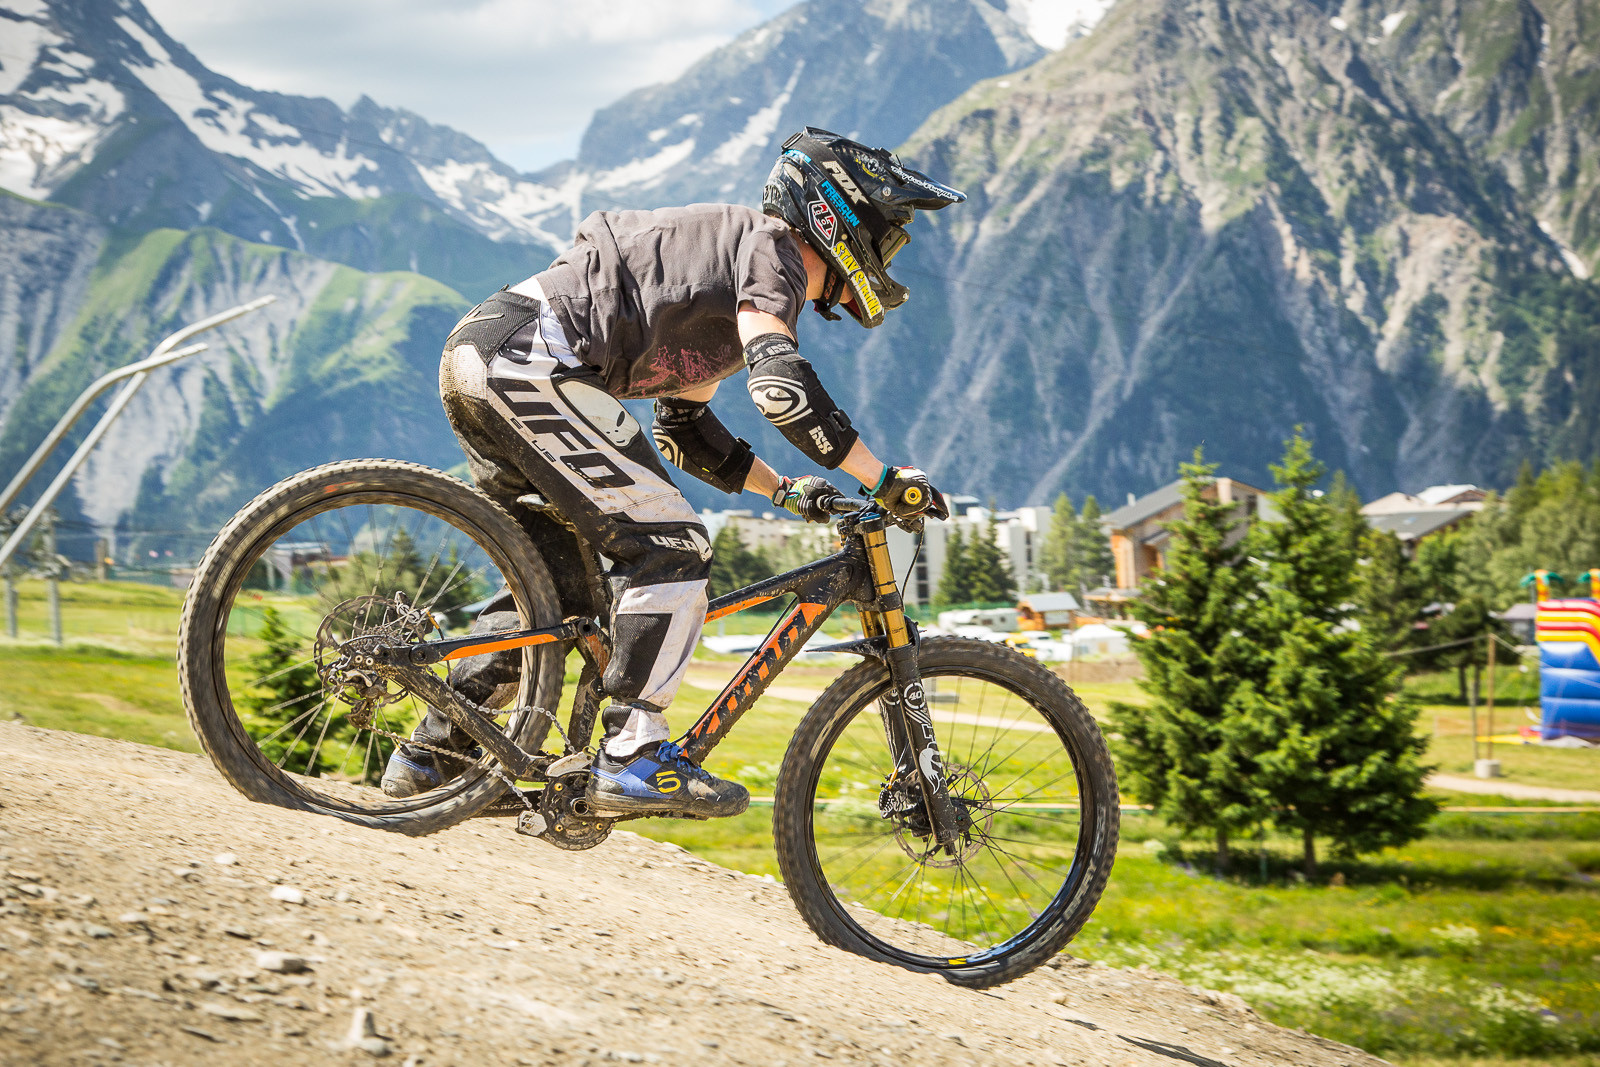 Kona Supreme Operator G-Out - G-Out Project: Crankworx L2A Air DH - Mountain Biking Pictures - Vital MTB